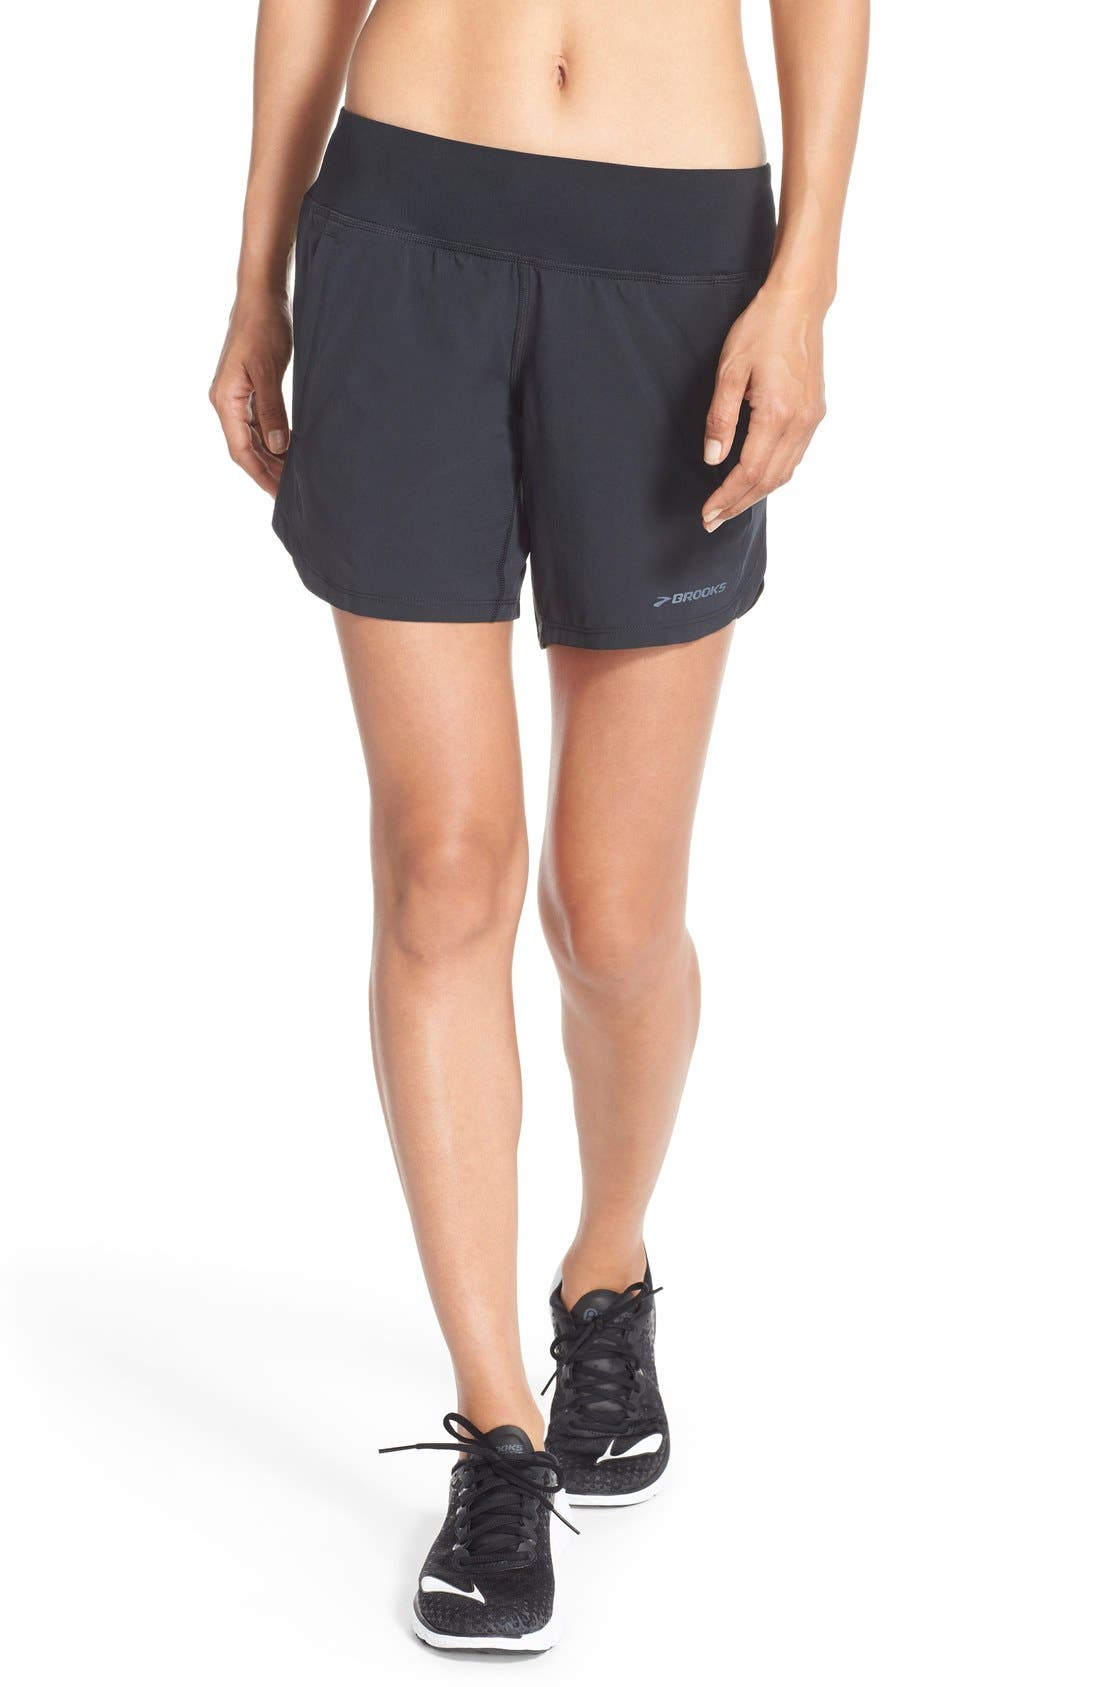 Alternate Image 1 Selected - Brooks 'Chaser 7' Running Shorts